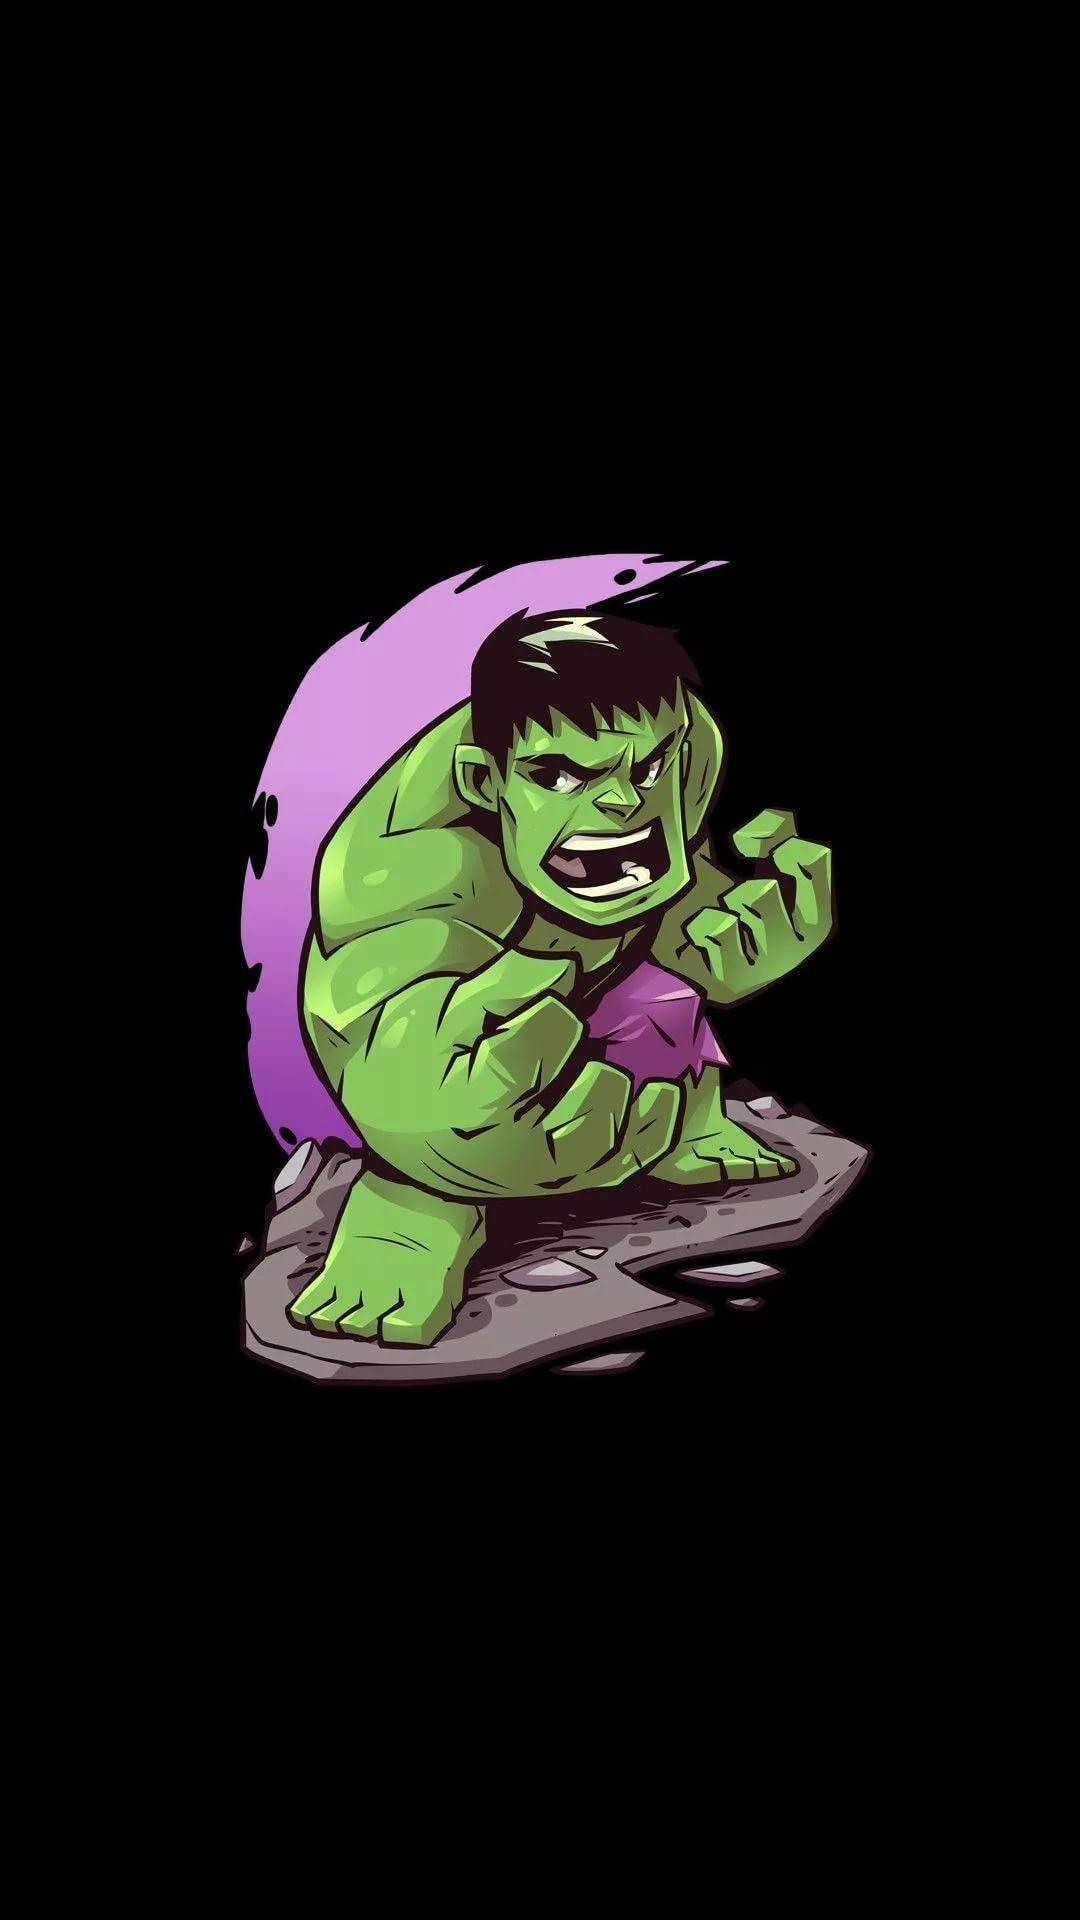 Hulk 3d Iphone Wallpapers 24 Images Wallpaperboat